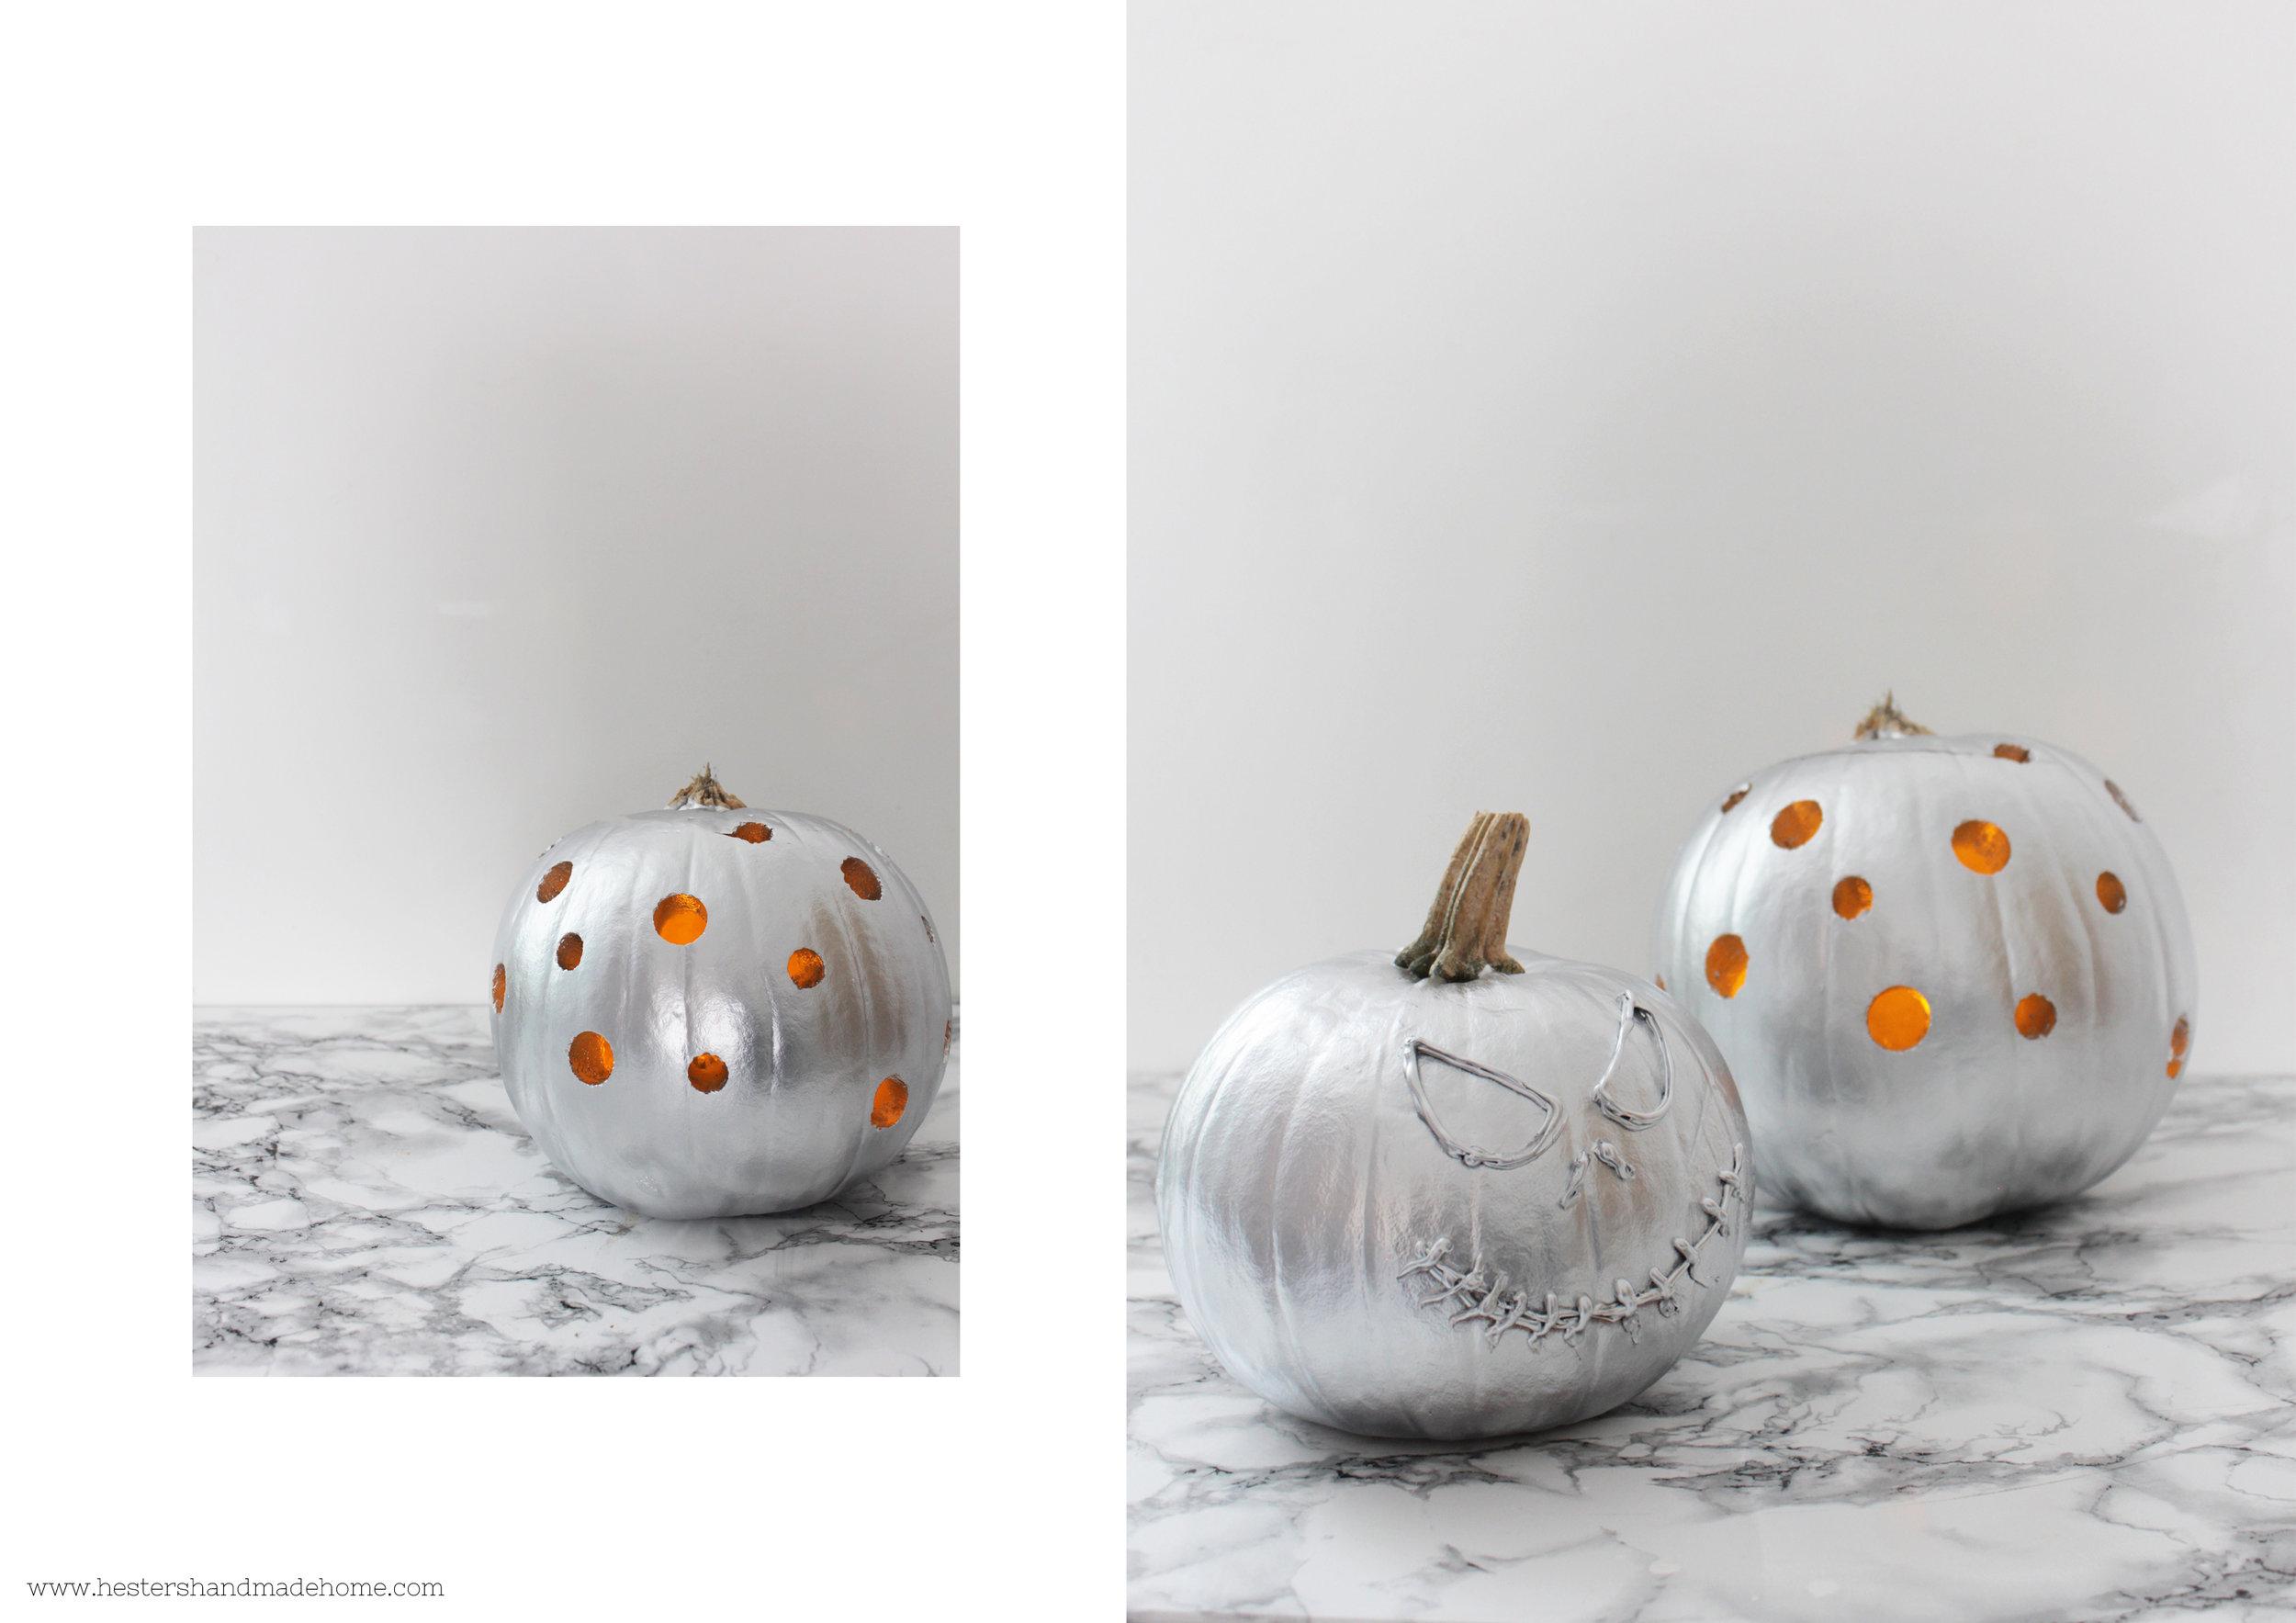 Pumpkin decorating by www.hestershandmadehome.com